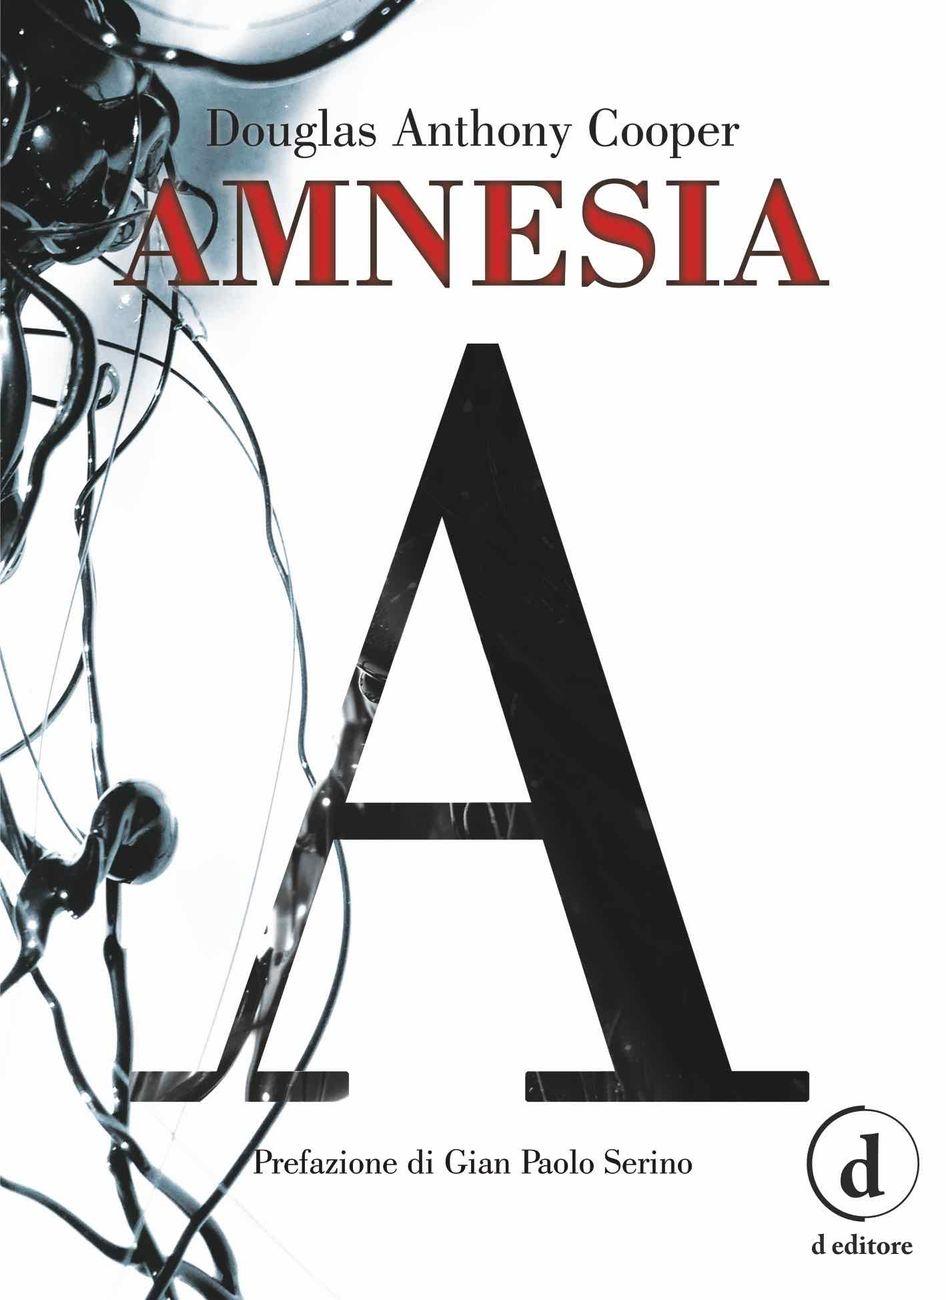 Douglas Anthony Cooper ‒ Amnesia (D Editore, Ladispoli 2018) _cover